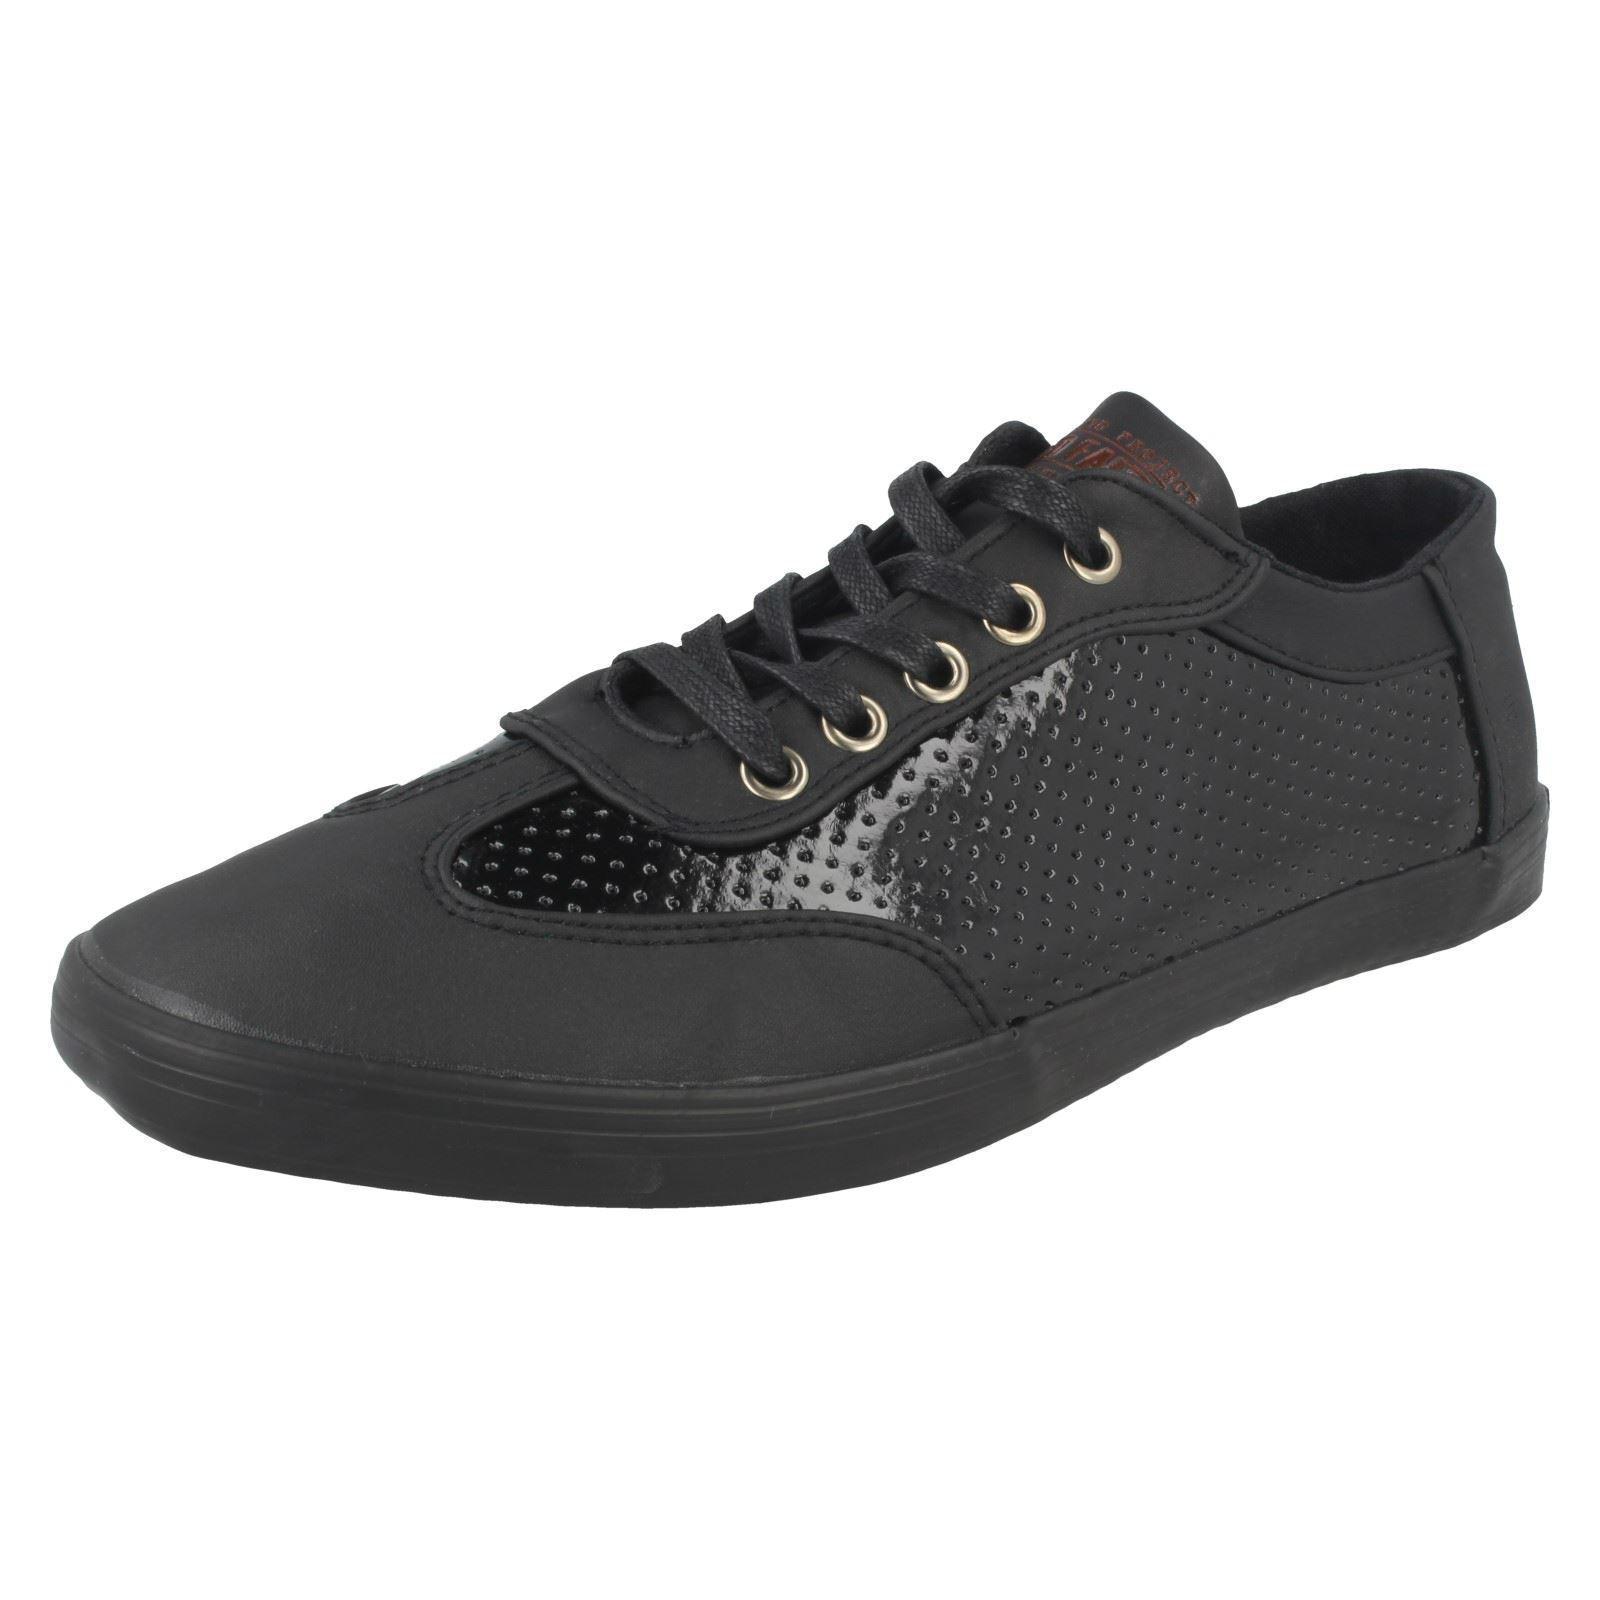 Twisted Faith P77 Mens Black Pumps (40B) / Trainer Casual Shoe (40B) Pumps (kett) 9dac5f